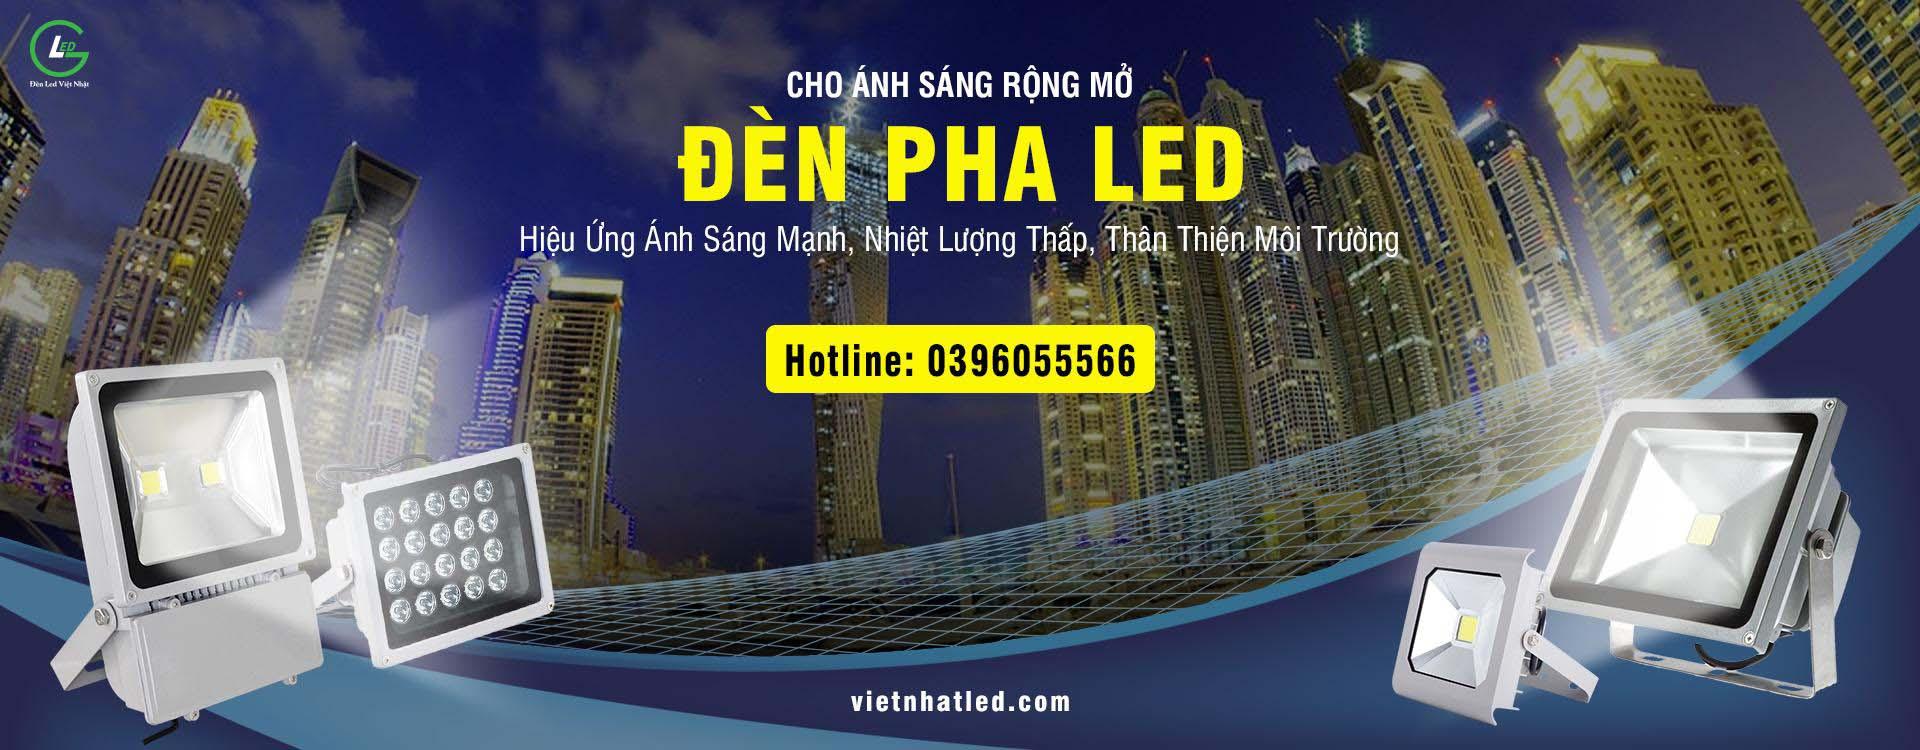 Đèn Led Việt Nhật - Banner 3